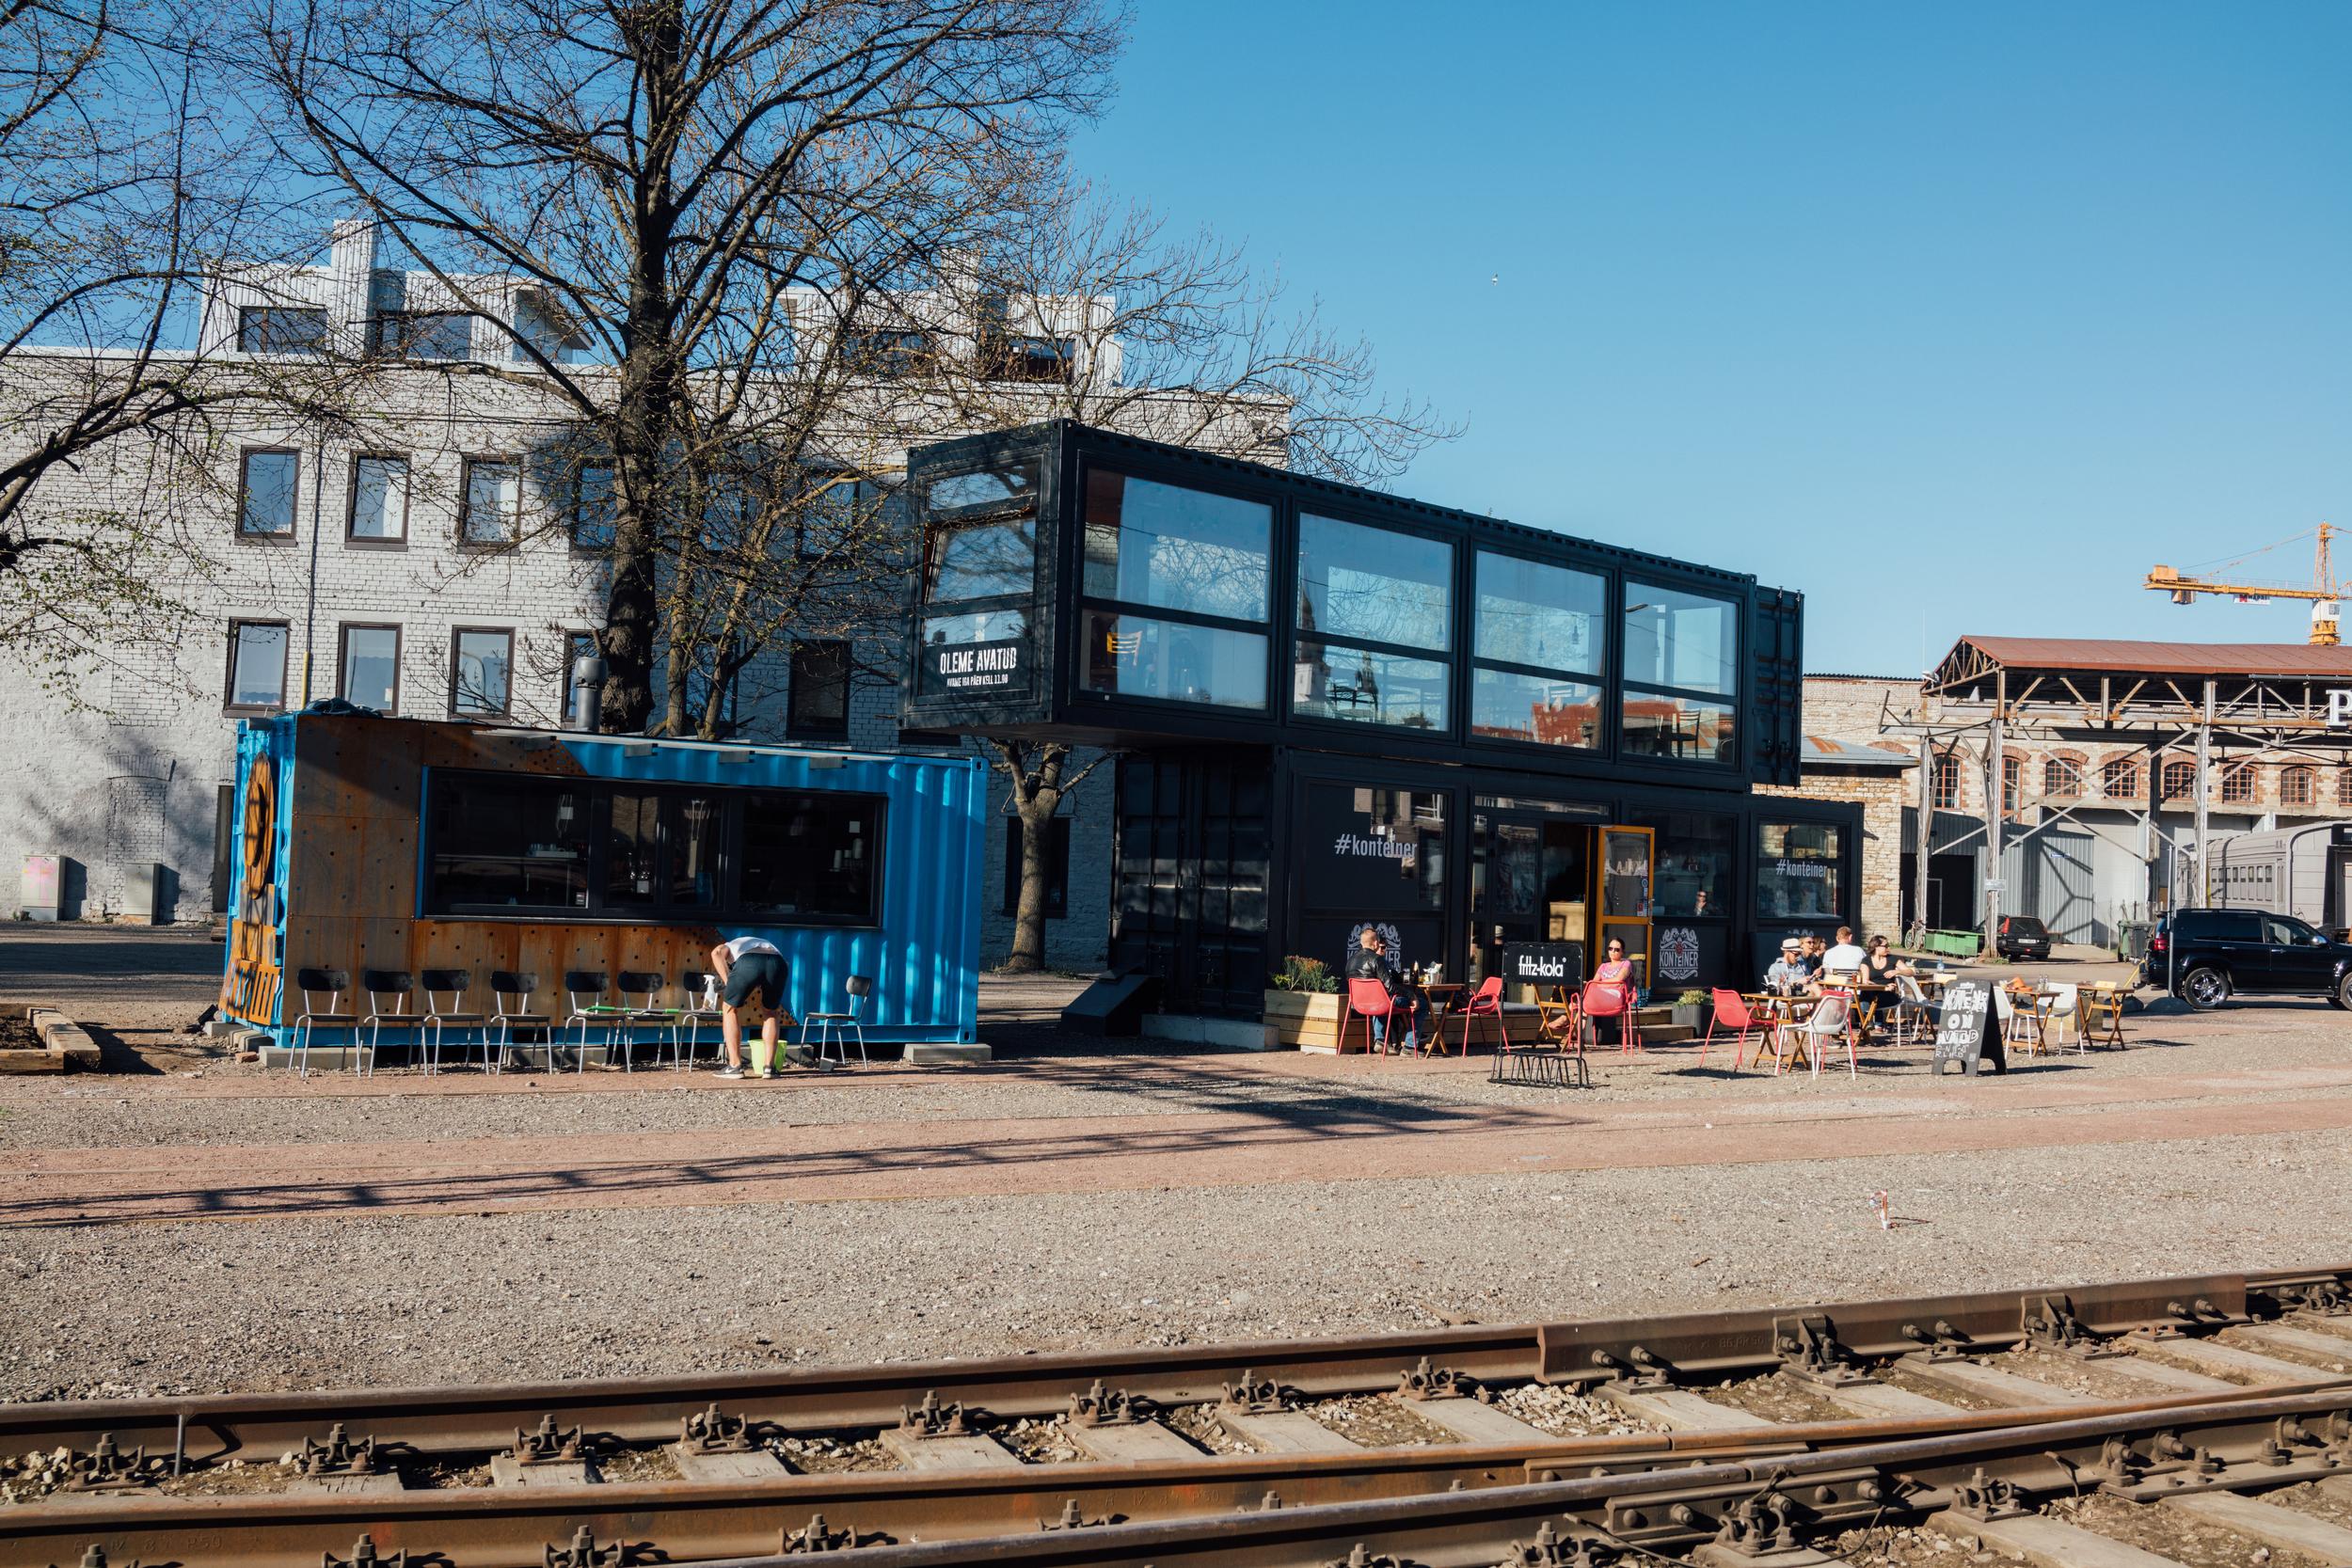 Railway tracks and shipping containers, Kalamaja, Tallinn